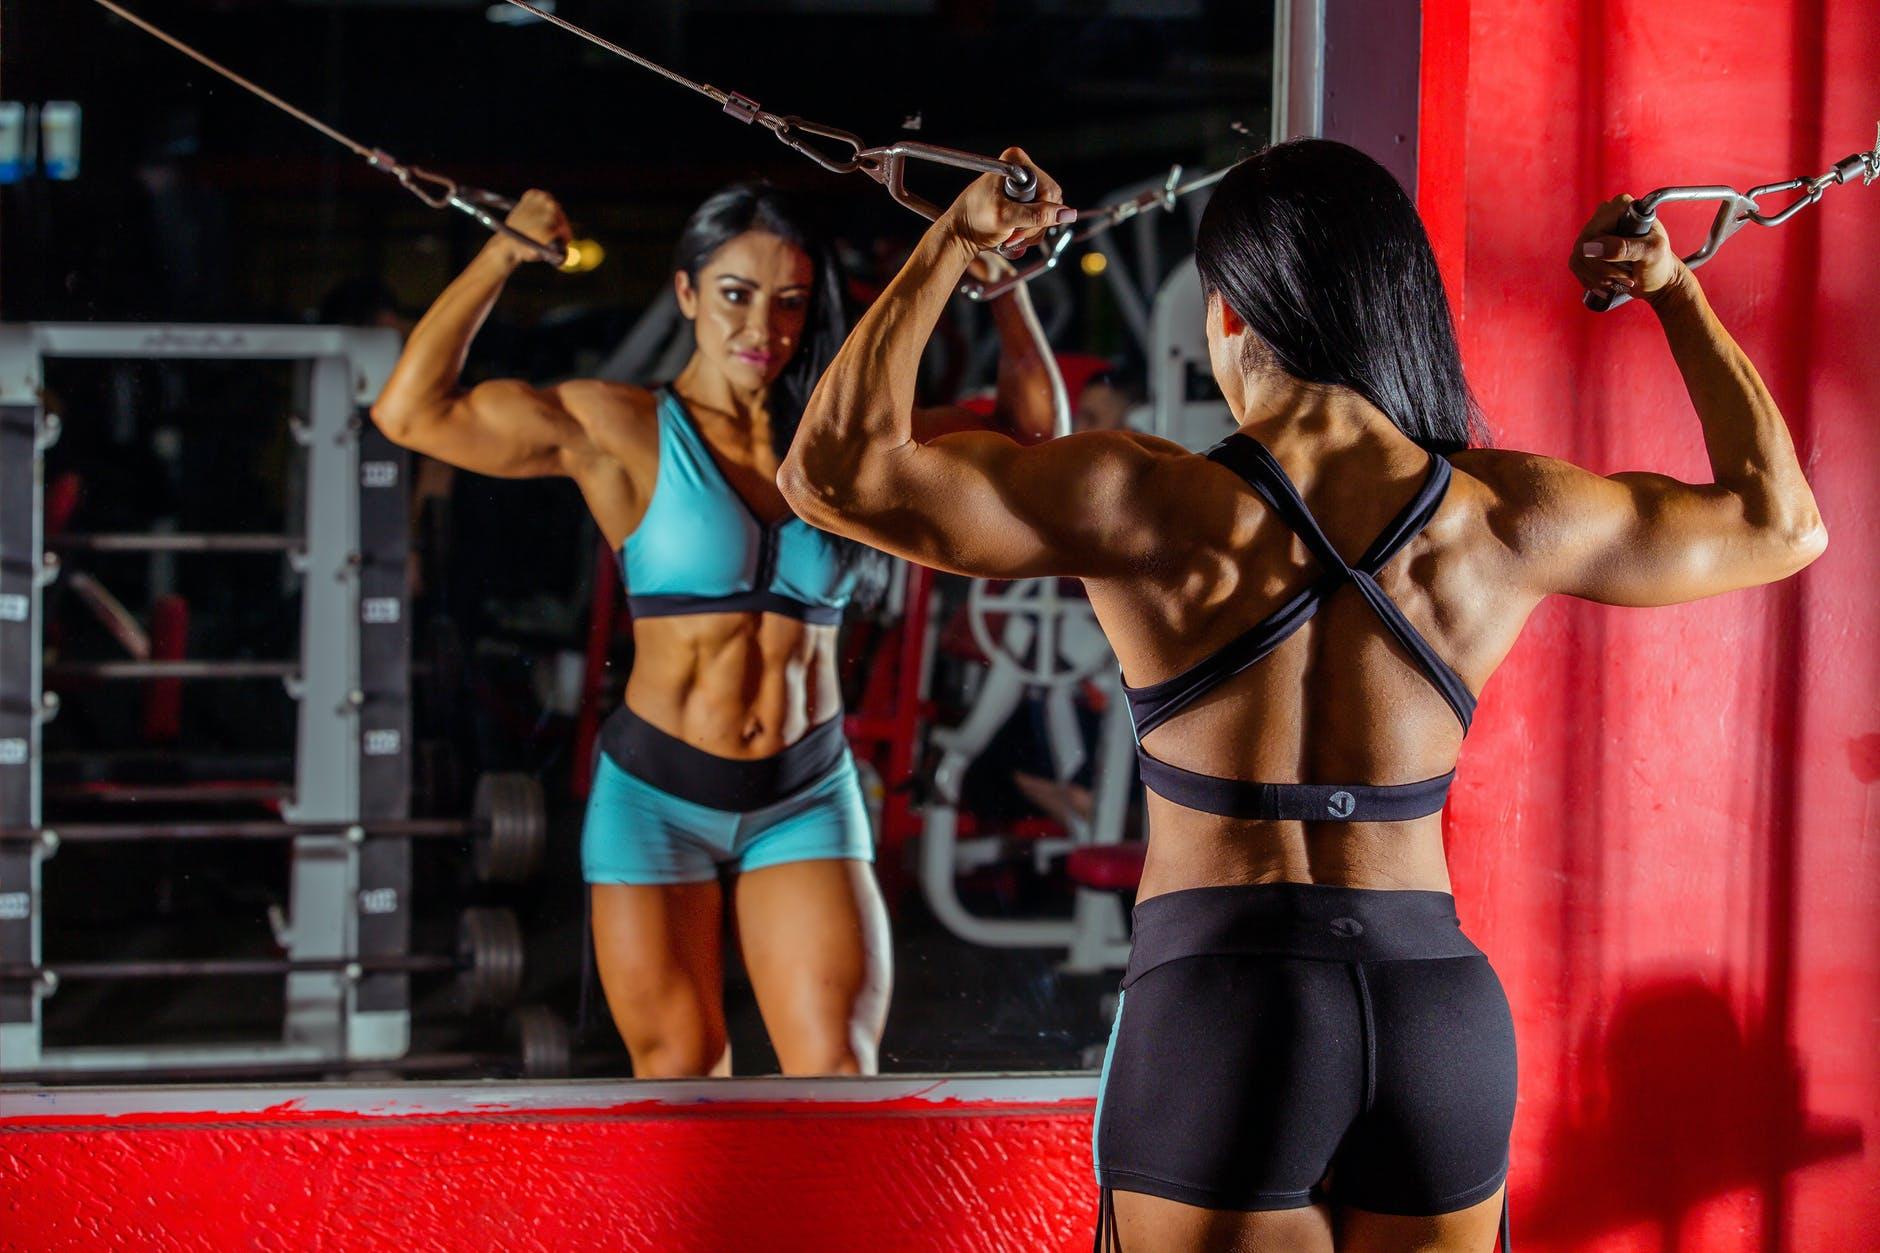 sarms for women bodybuilder